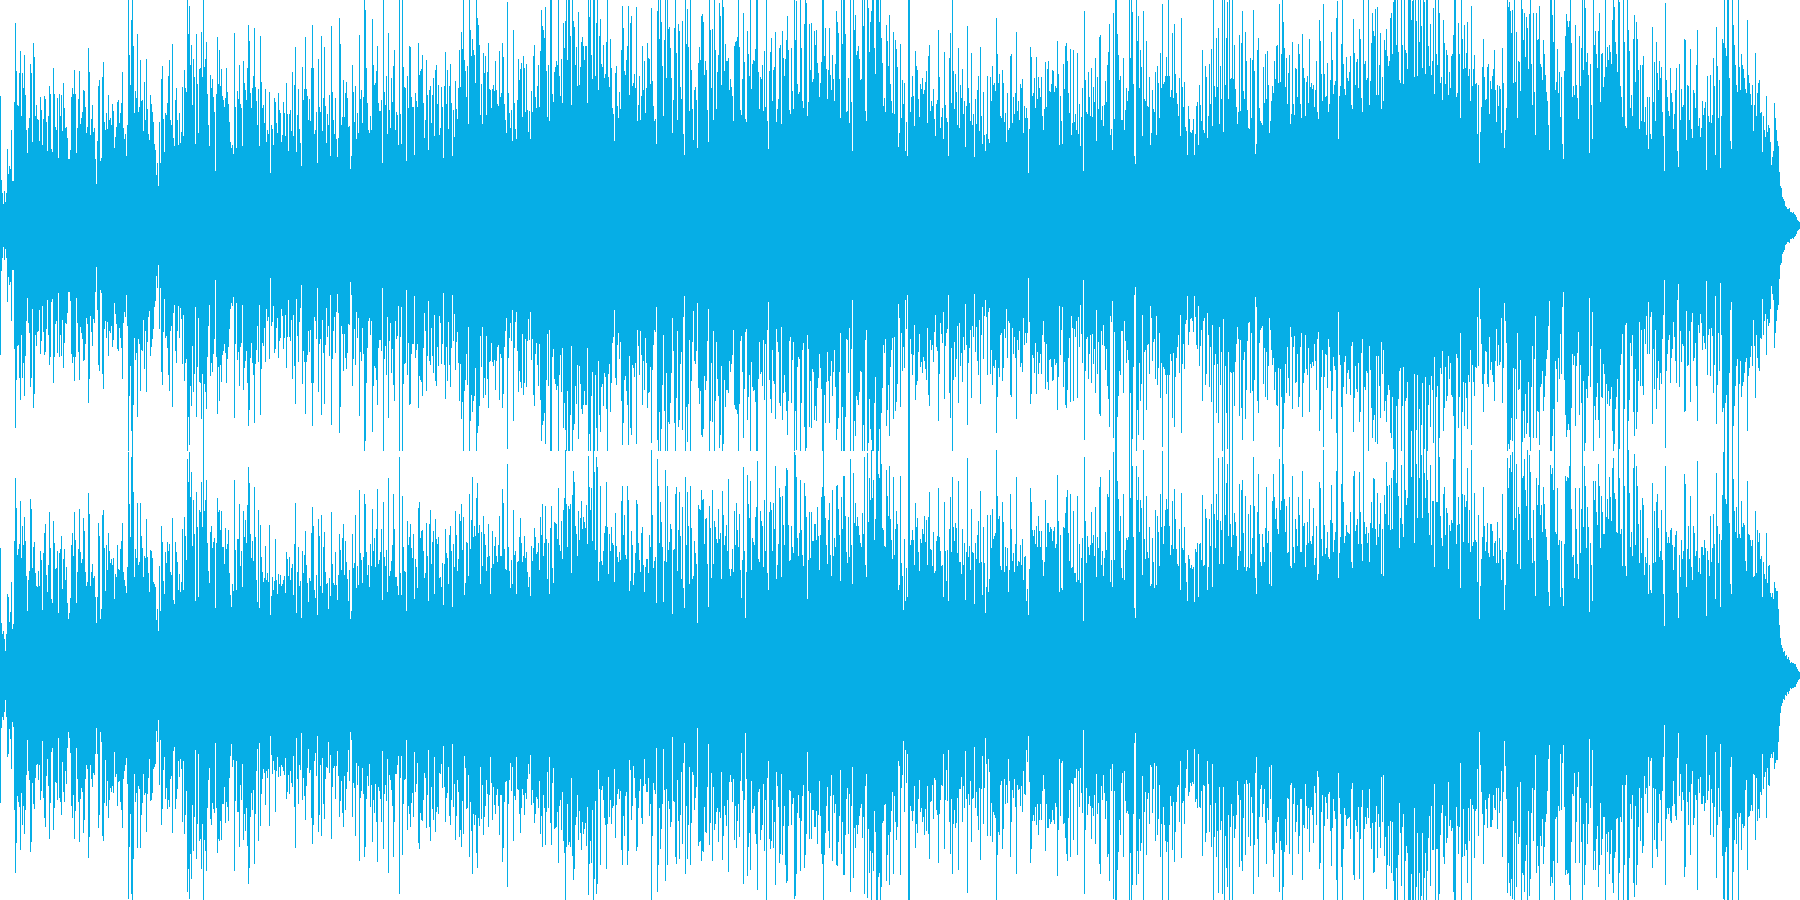 Extentionの再生済みの波形